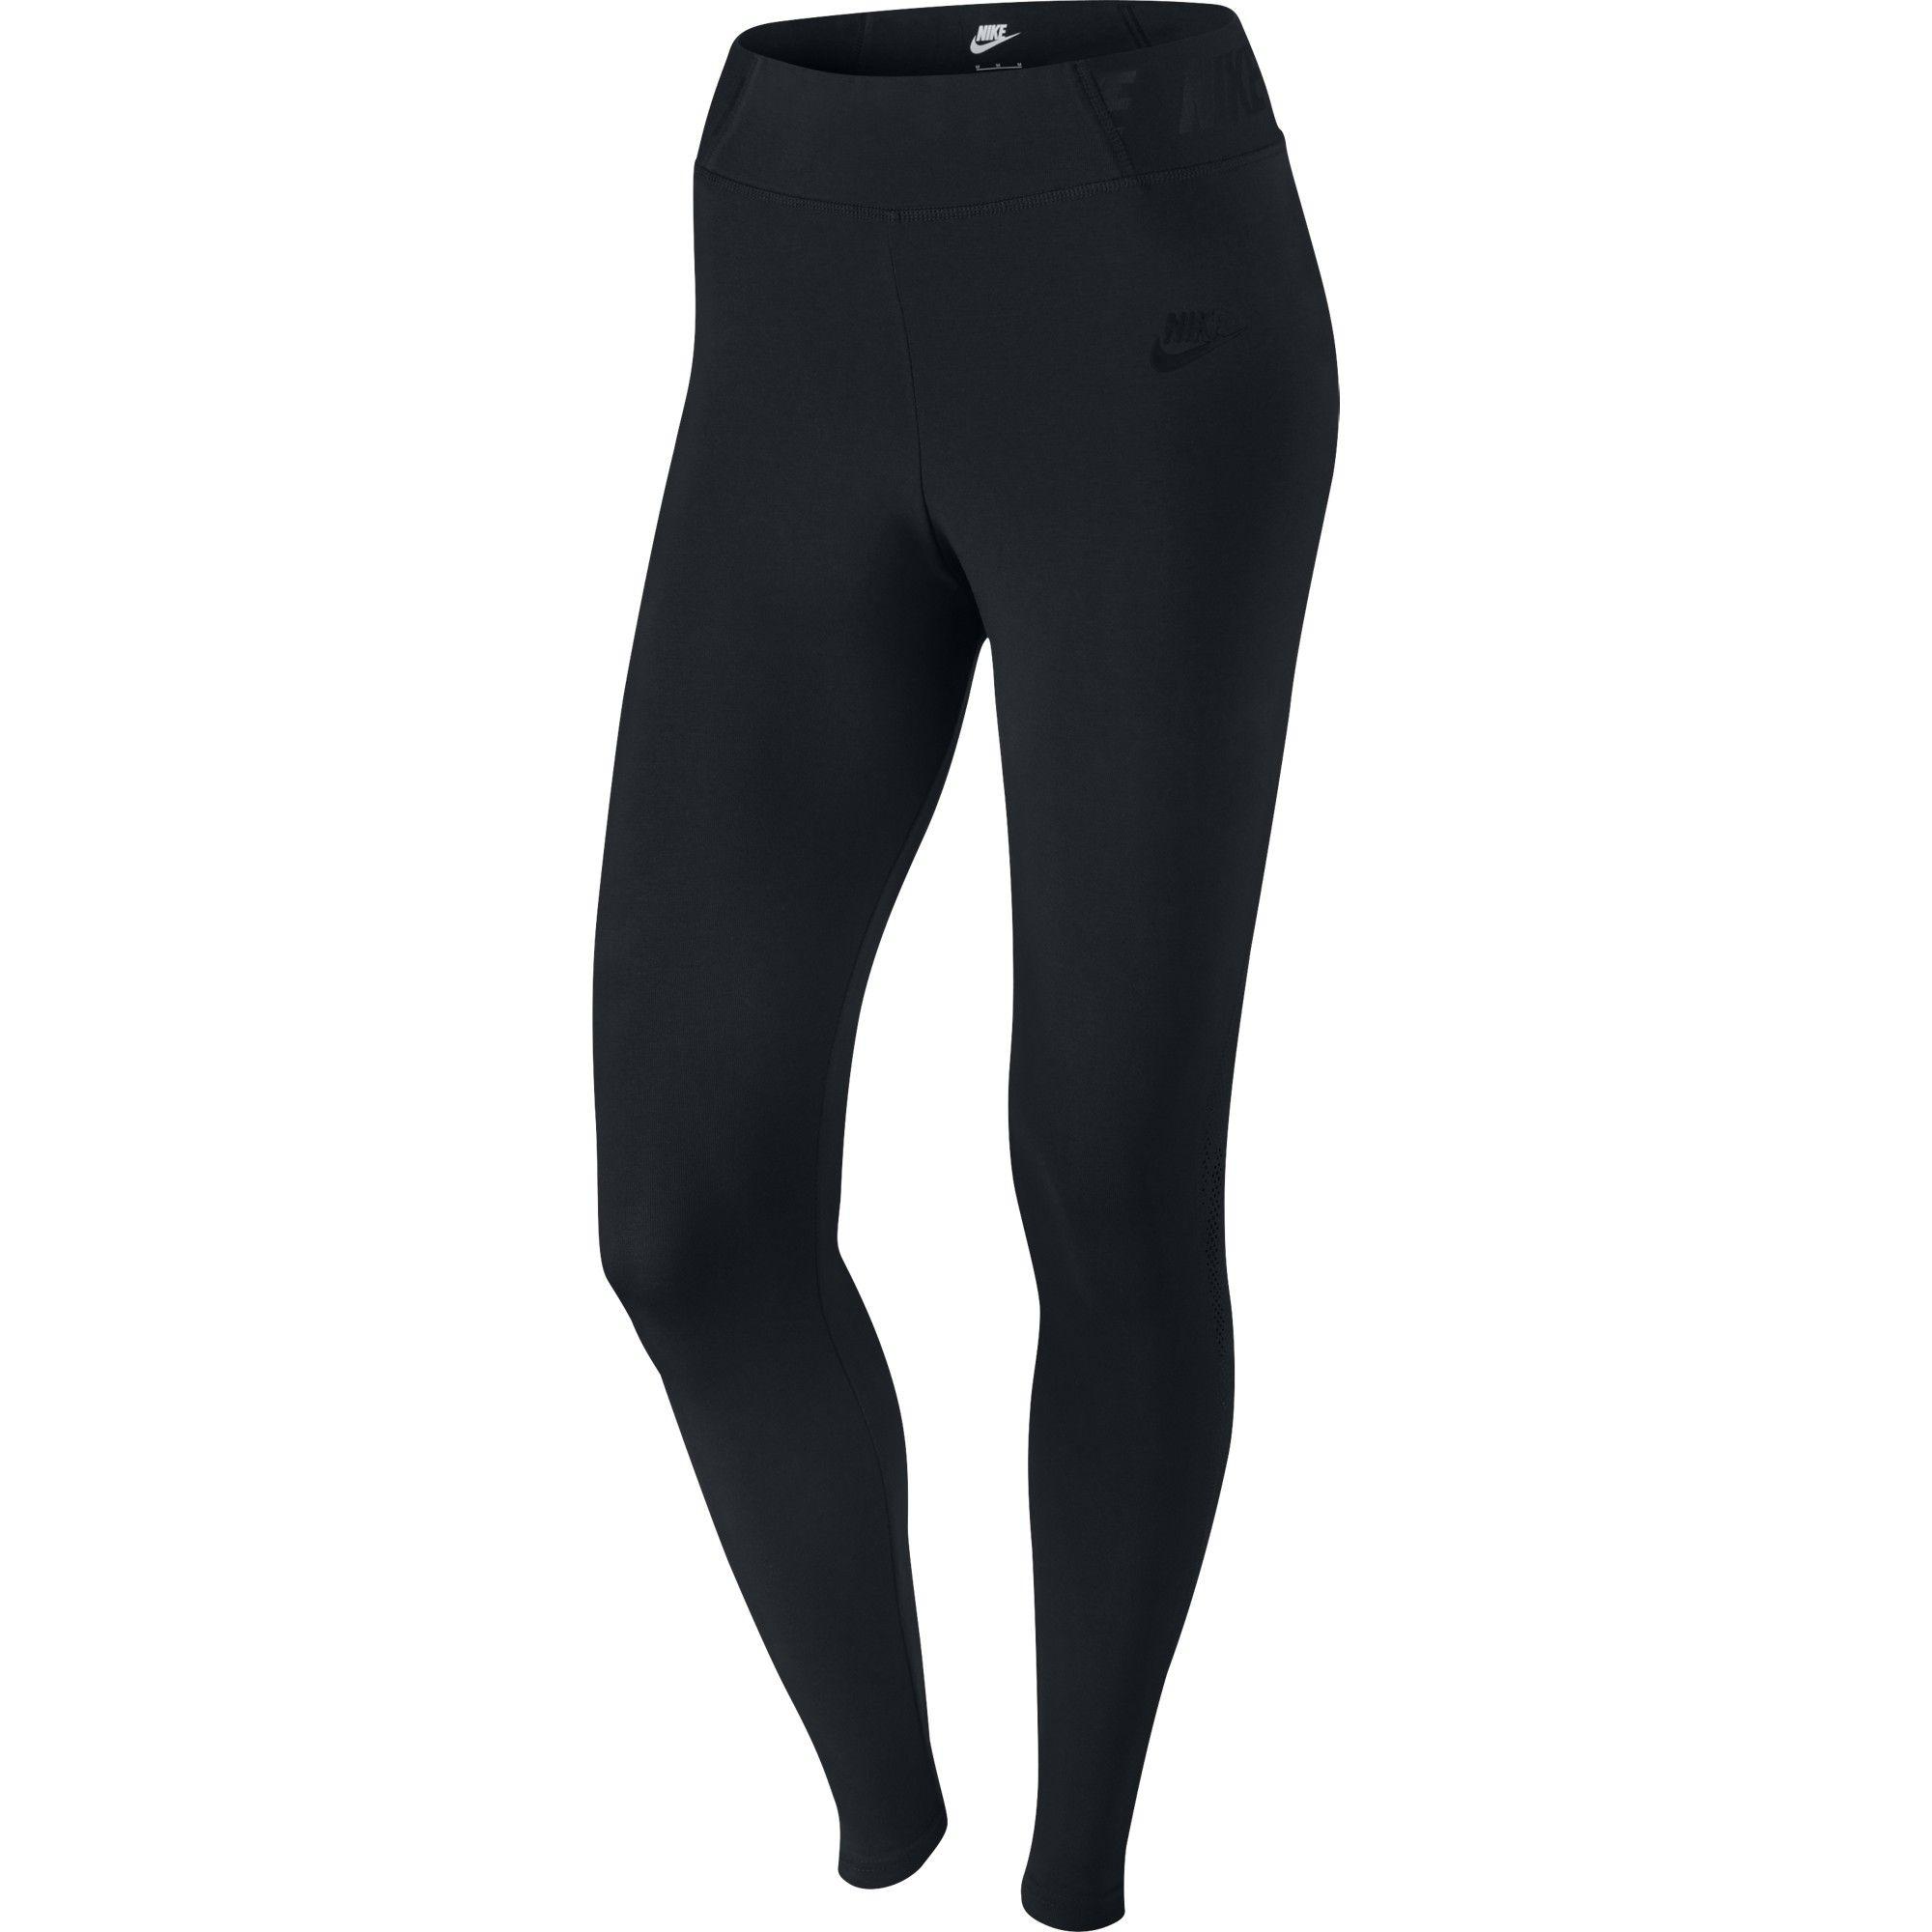 best loved promo code great fit Legging Nike Bonded Mesh - 726089-010 - Pegashoes